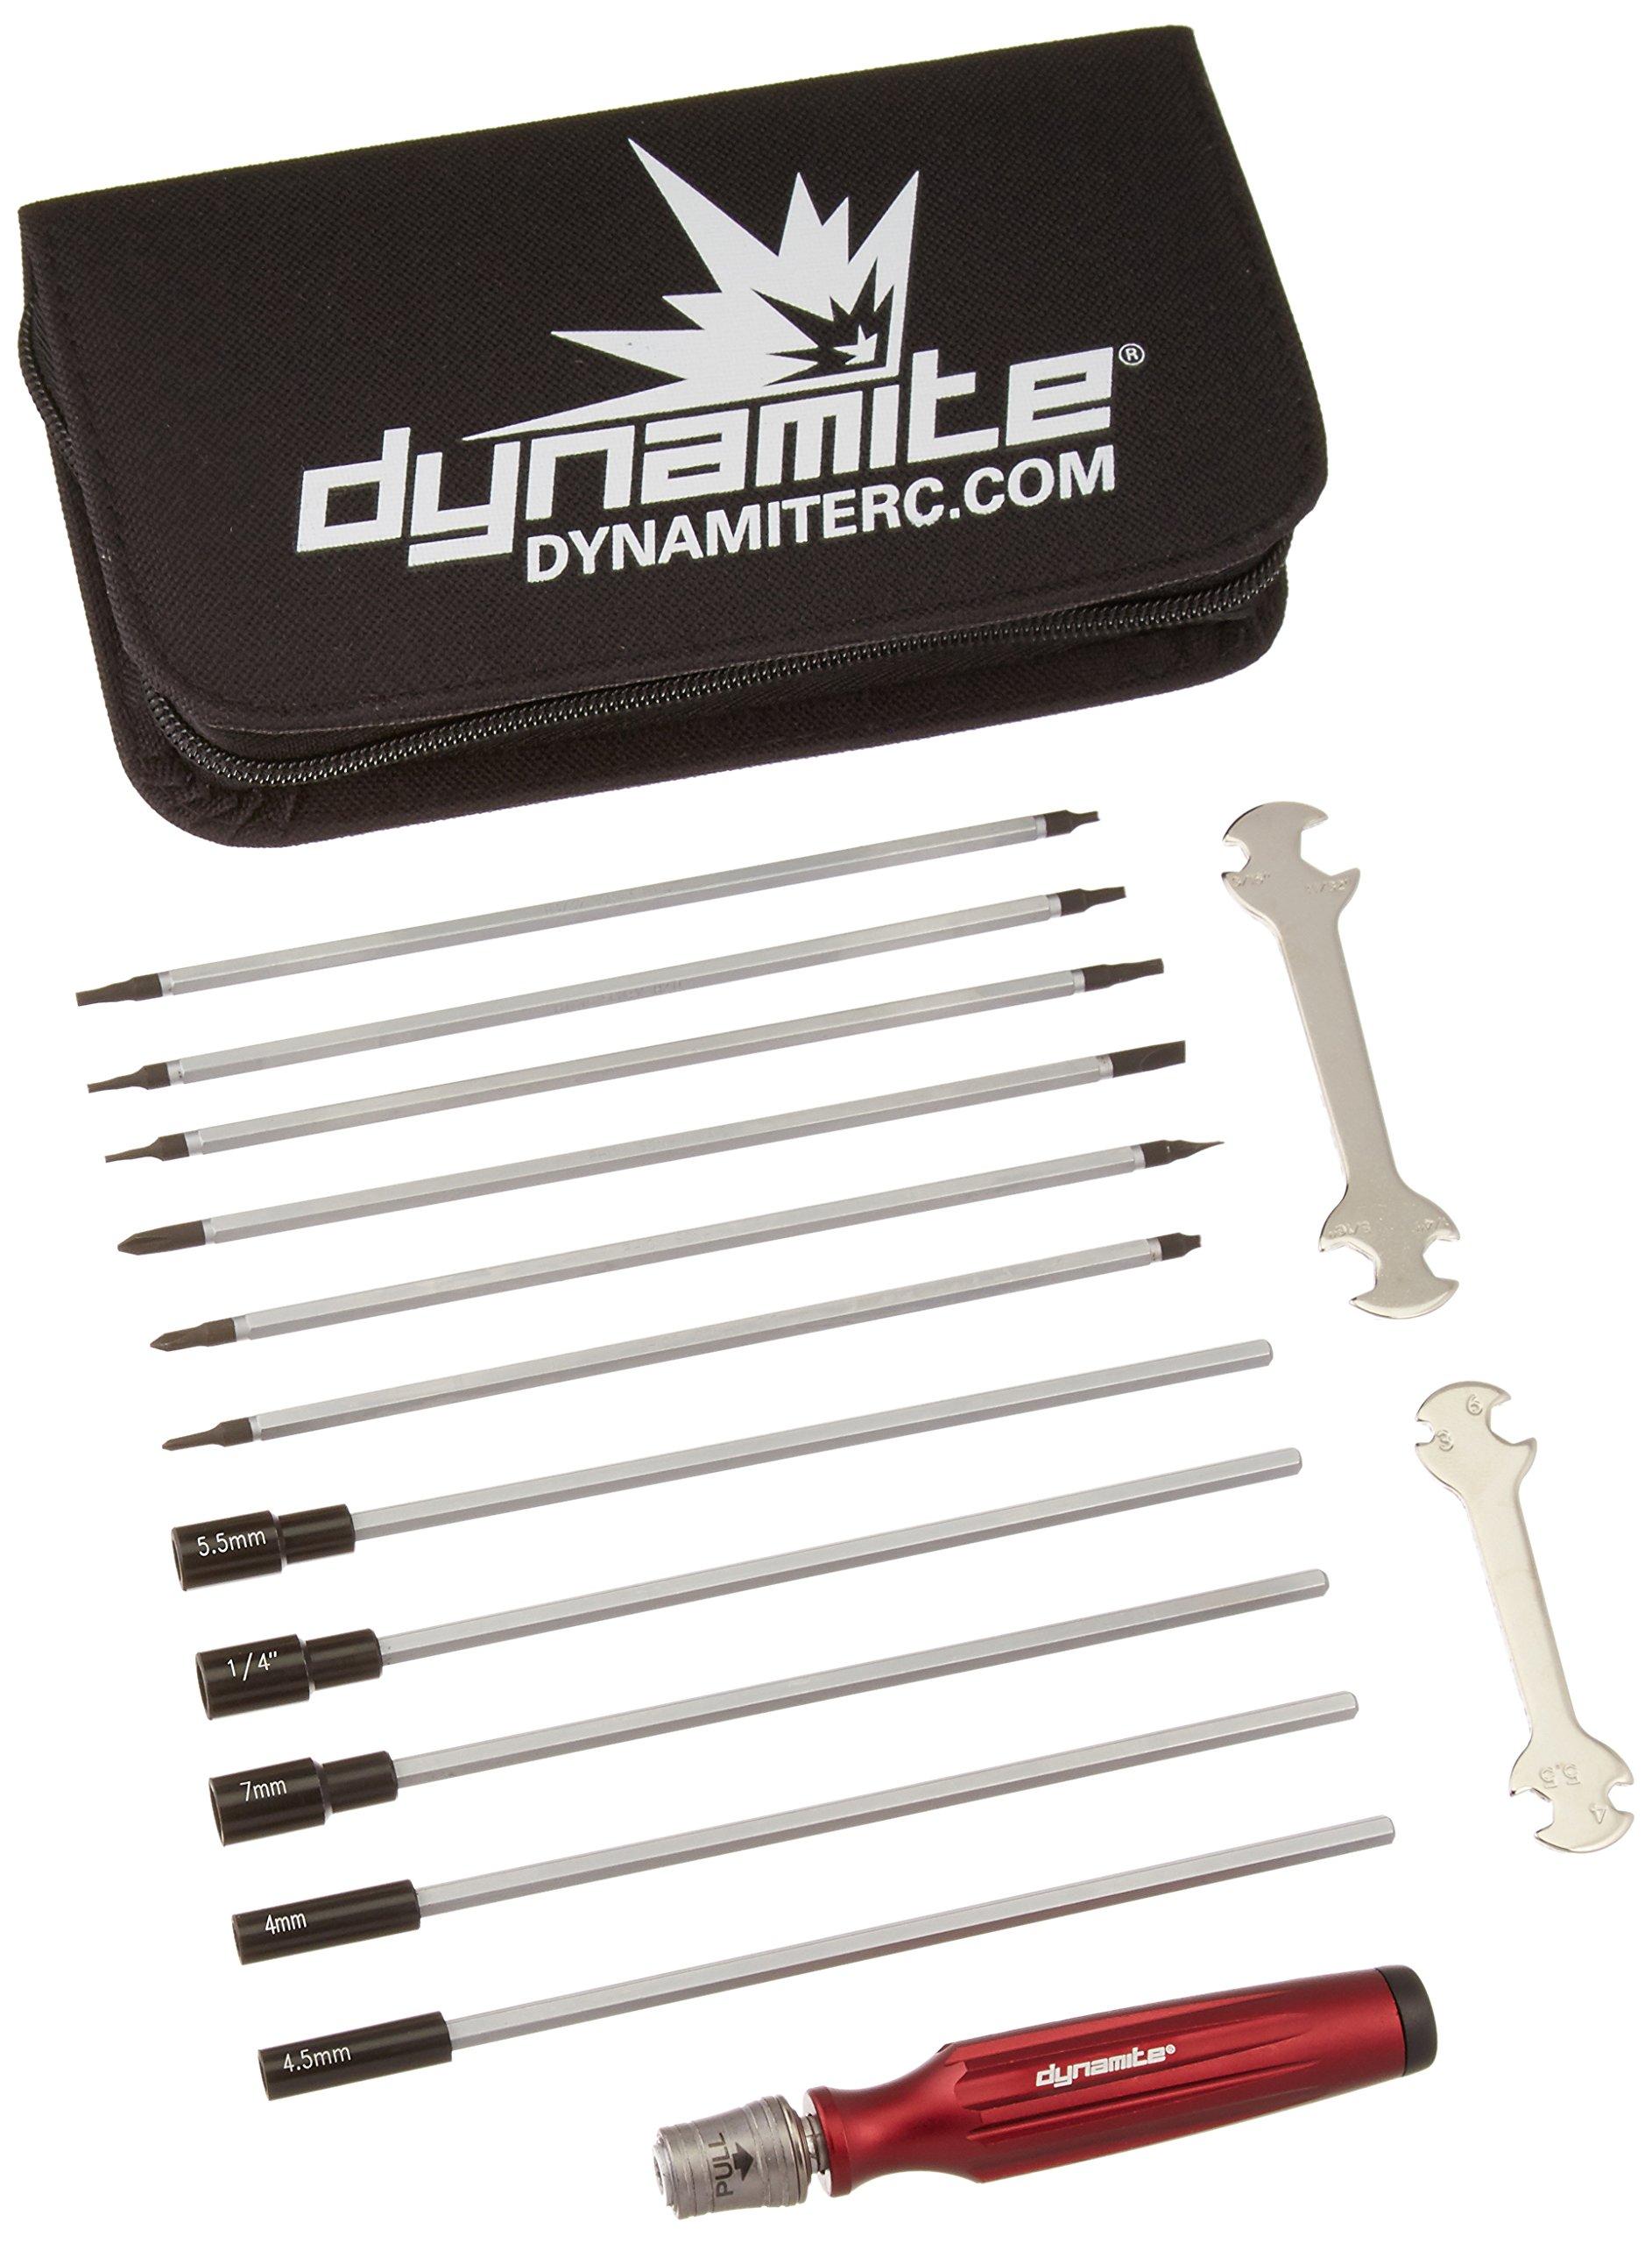 Dynamite Start Up Tool Set, DYNT0501